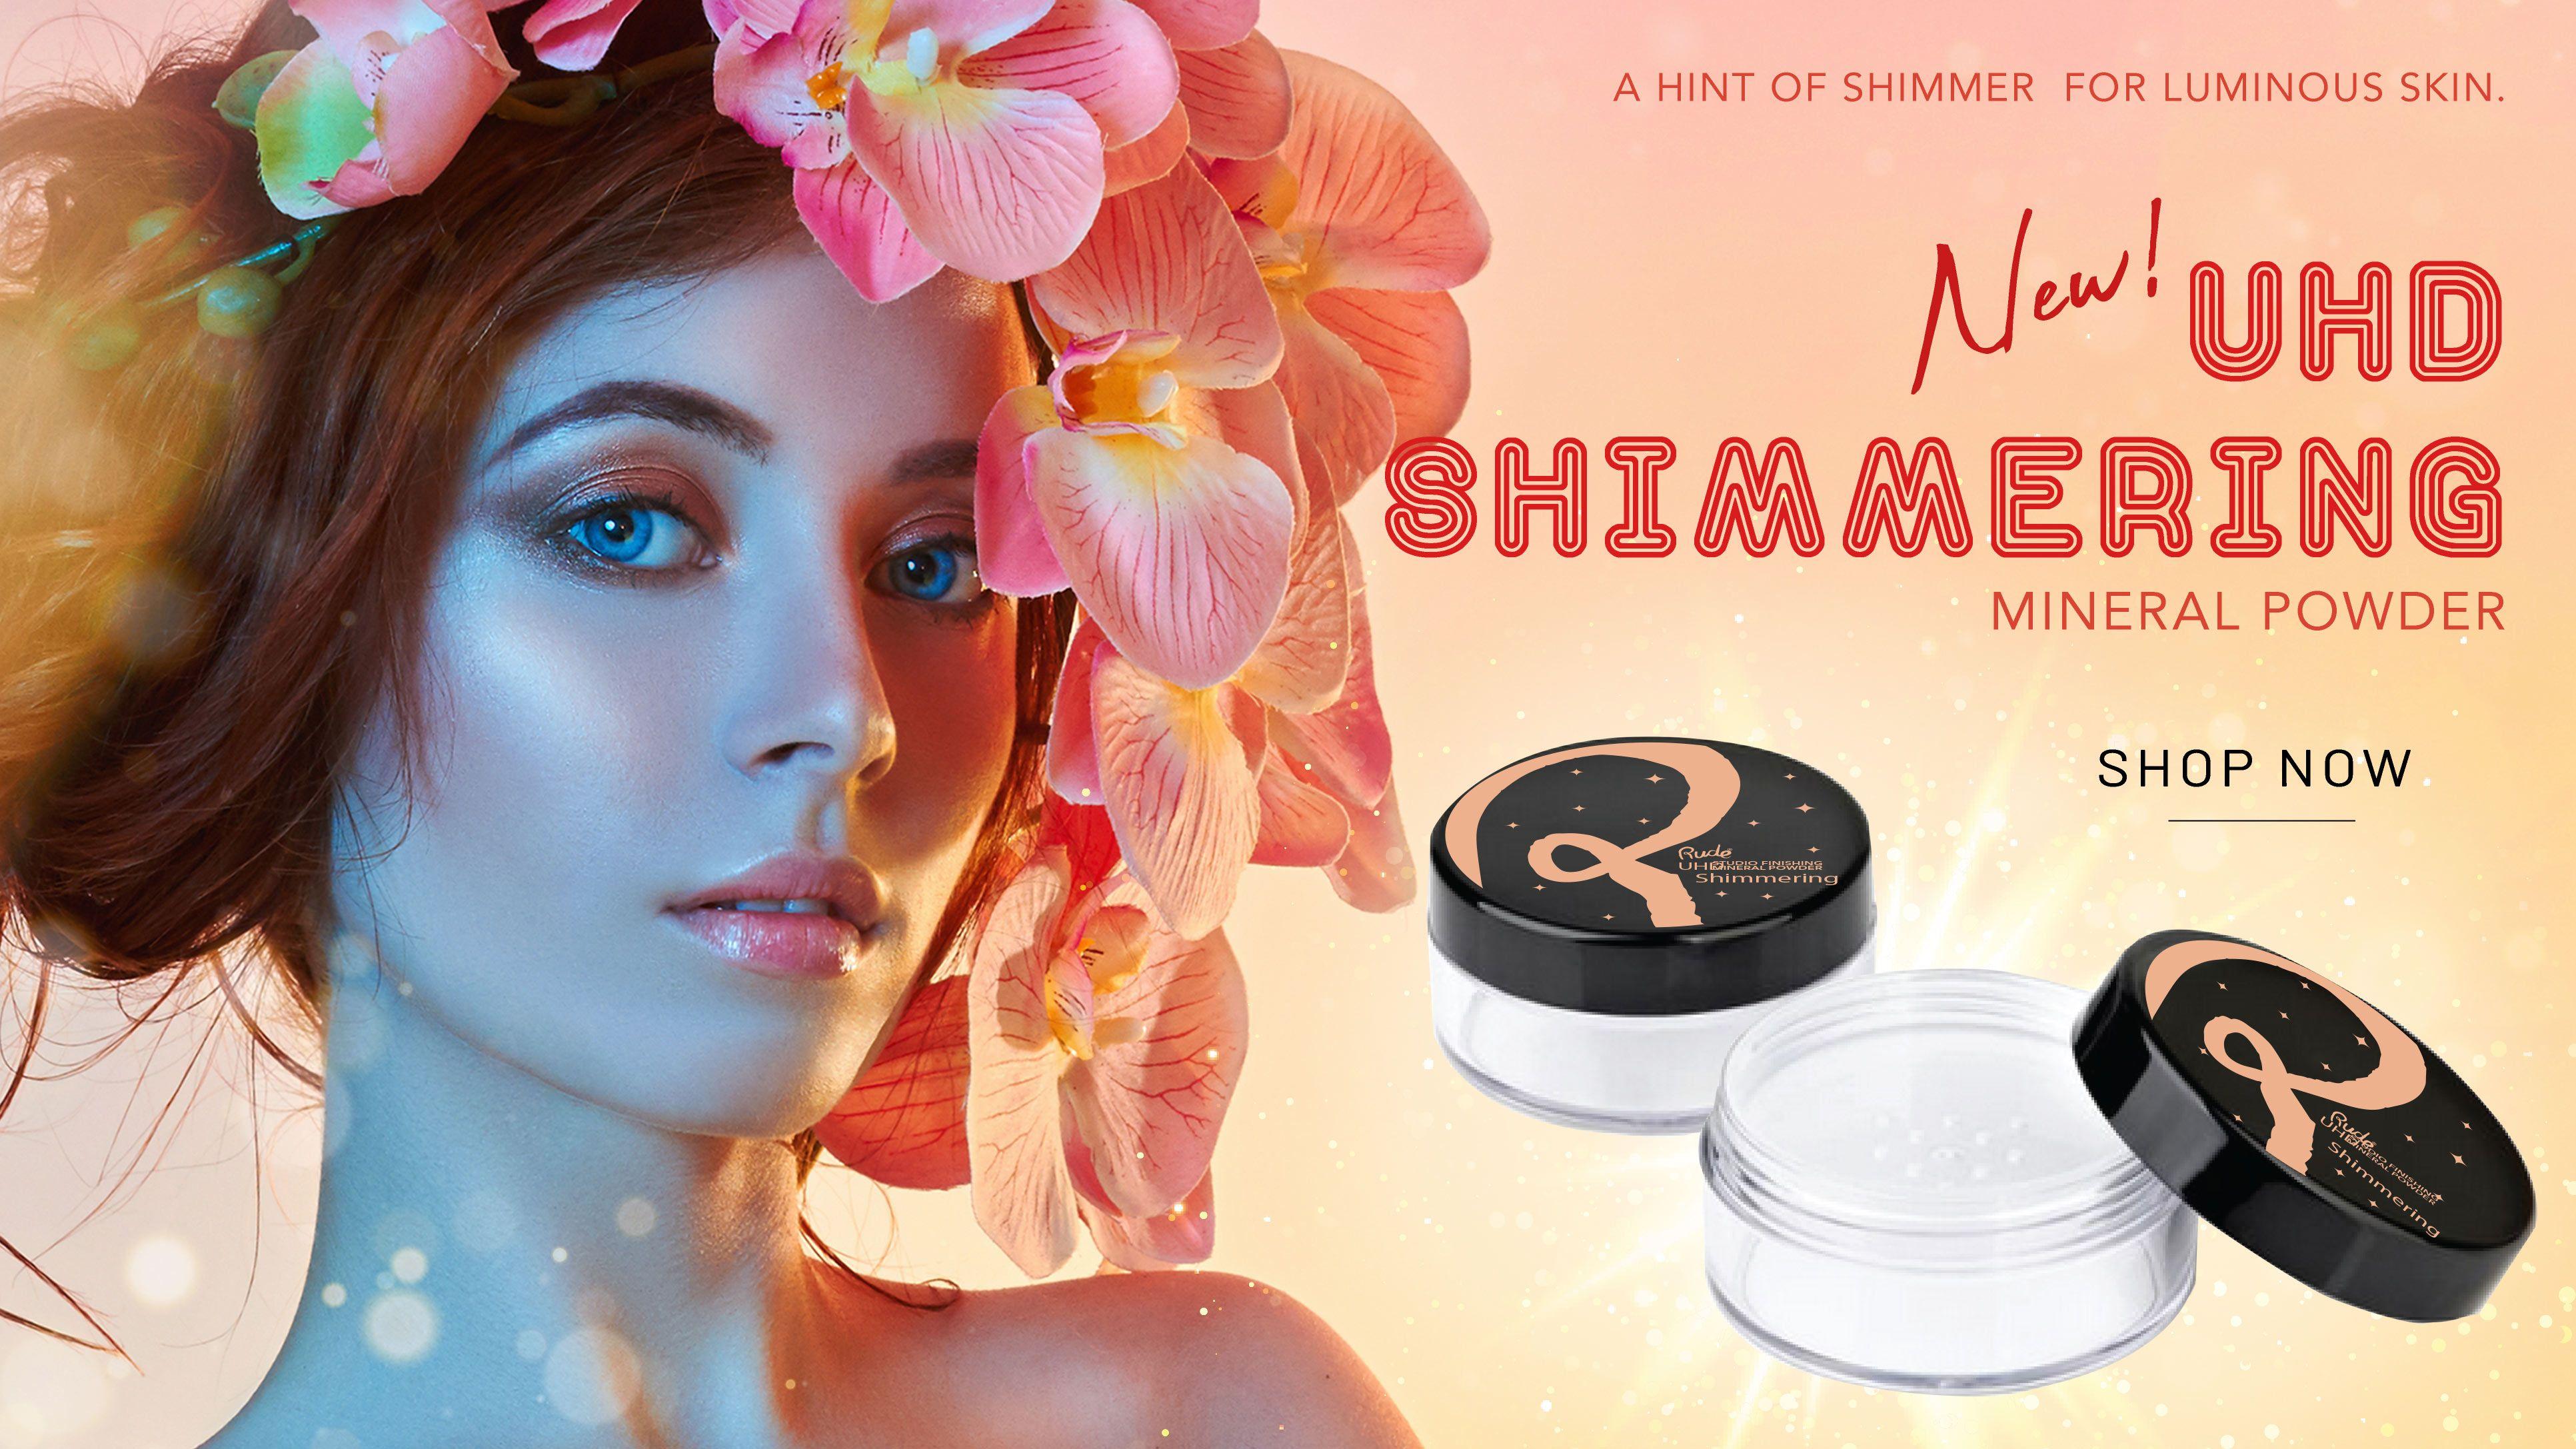 UHD Shimmering Mineral Powder Popular makeup brands